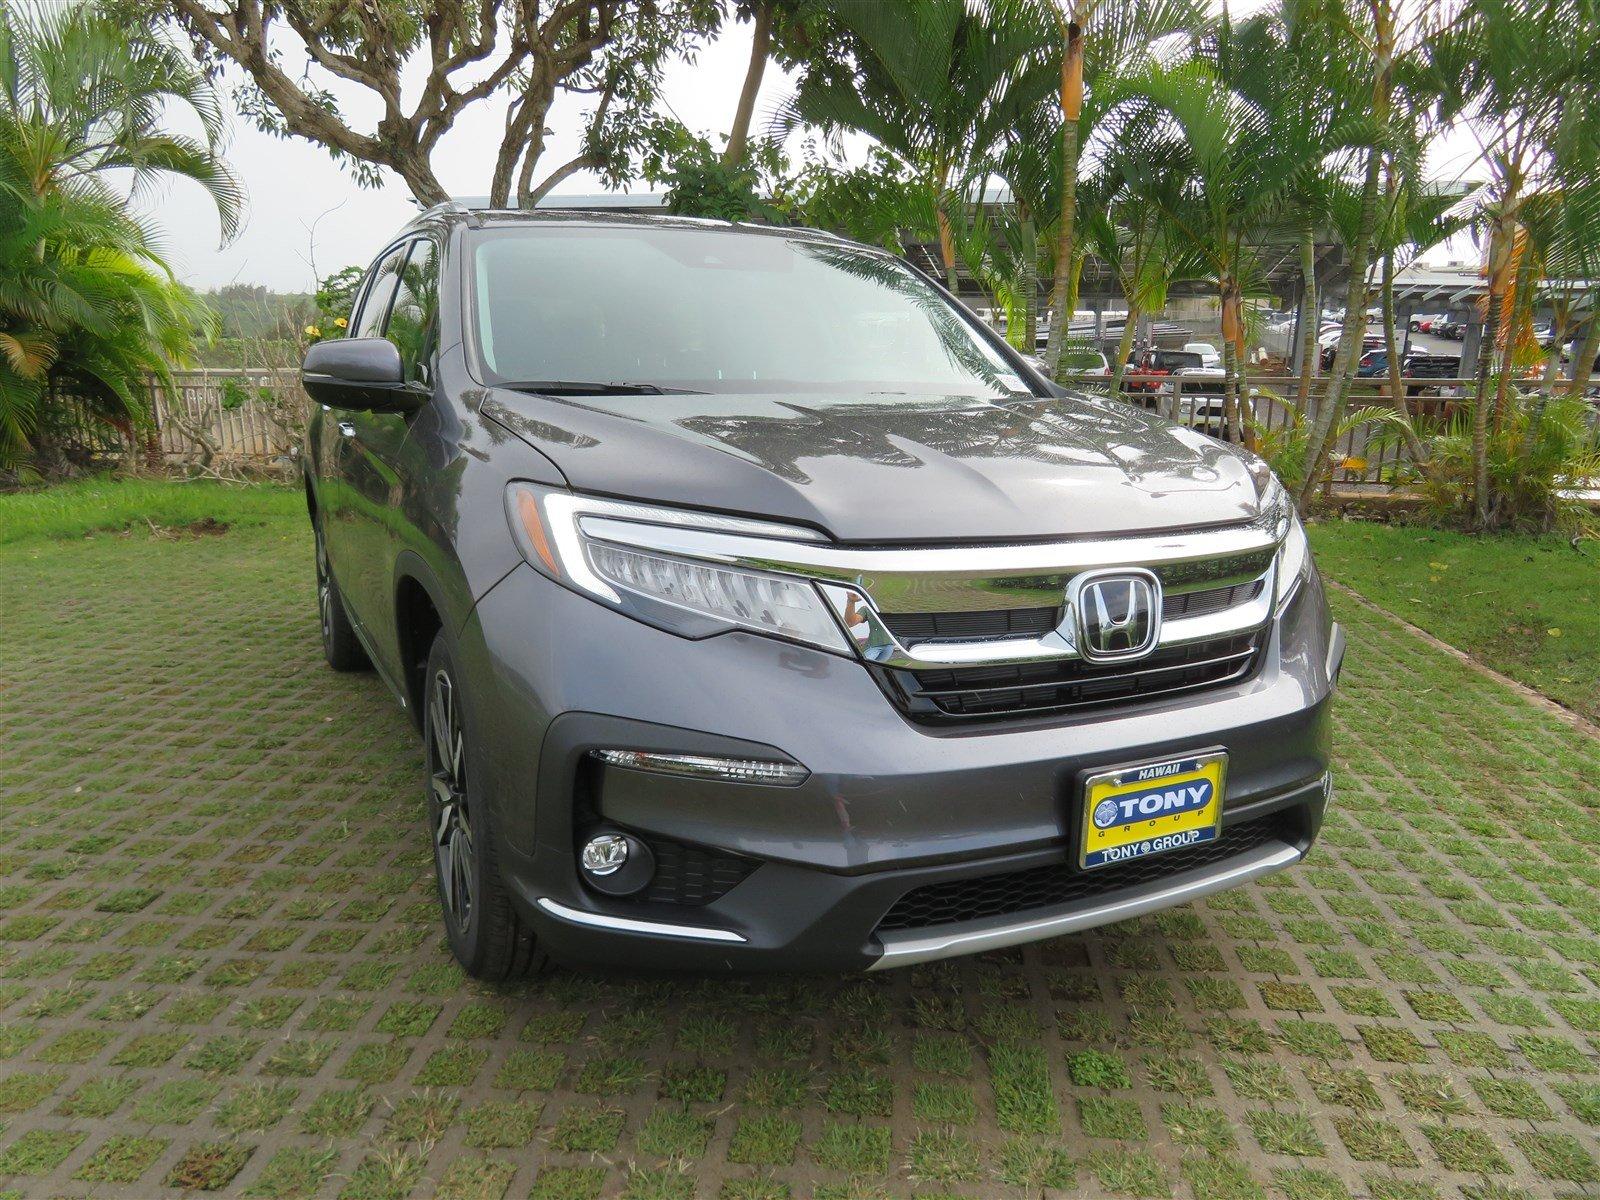 Used Cars Oahu >> New 2018 2019 Honda Dealer Honolulu Hawaii New Used Cars For